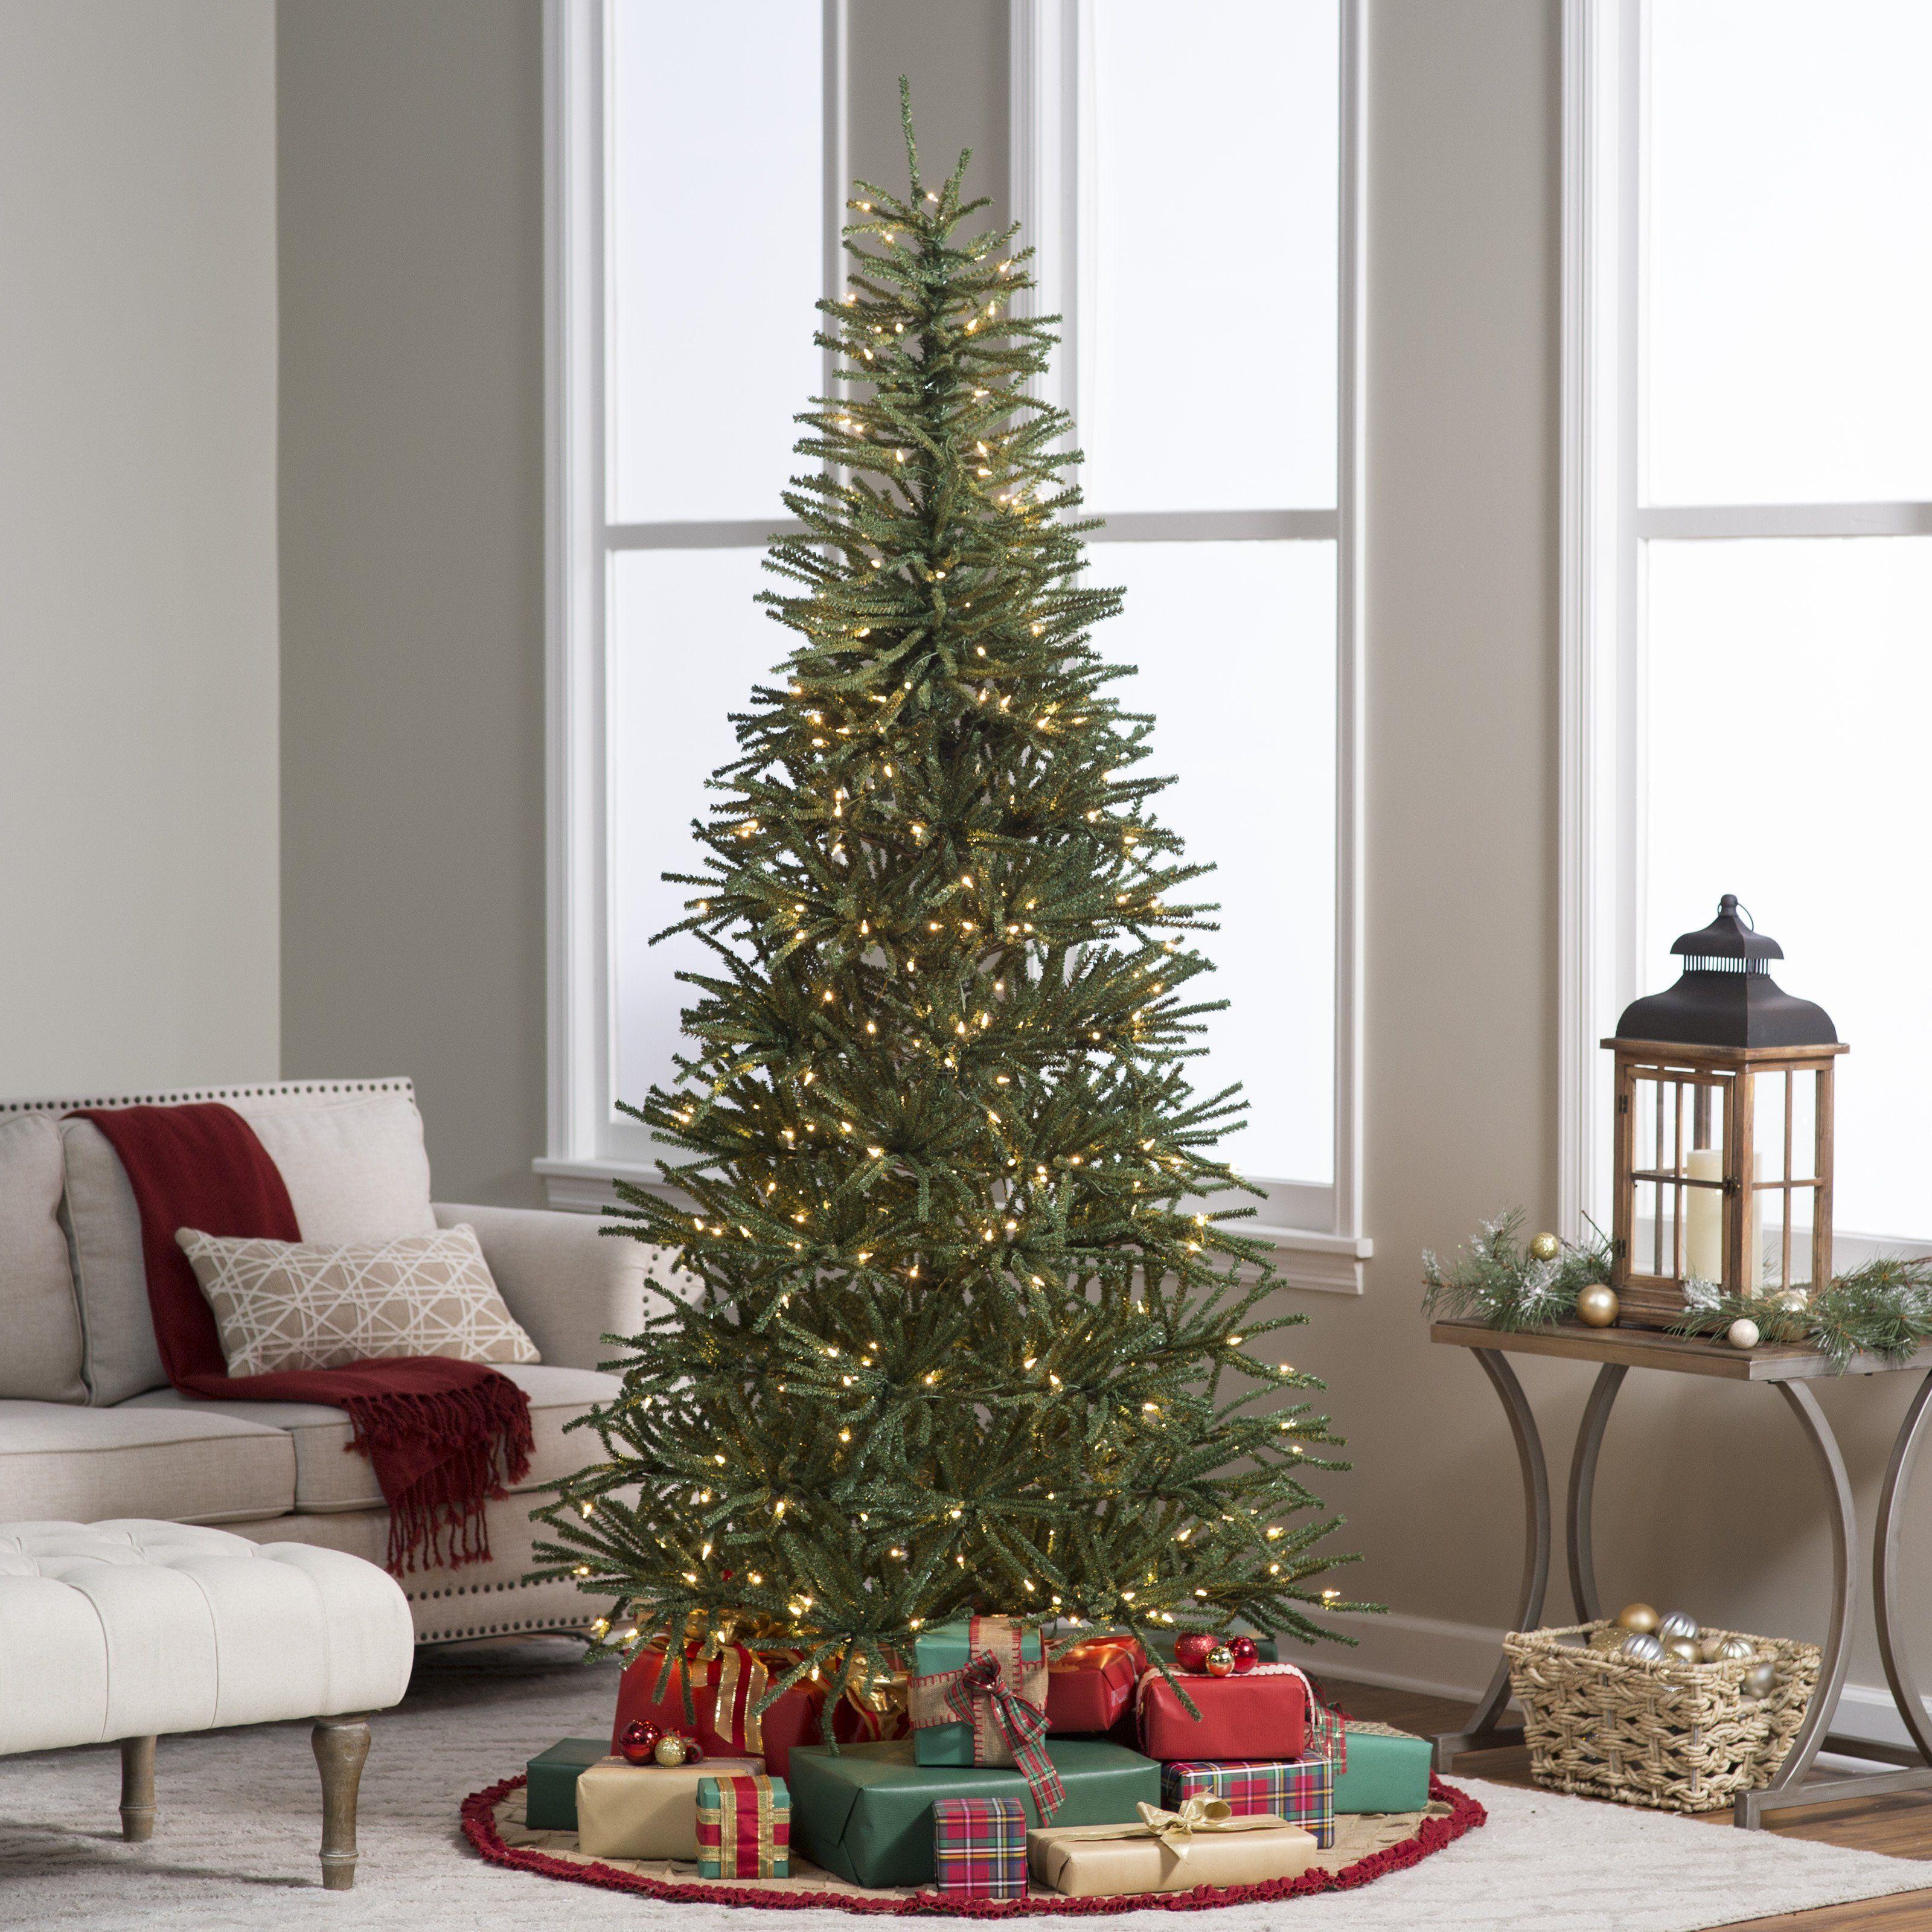 7 5 Ft Delicate Pine Slim Pre Lit Christmas Tree Www Hayneedle Com Pre Lit Christmas Tree Pencil Christmas Tree Slim Christmas Tree